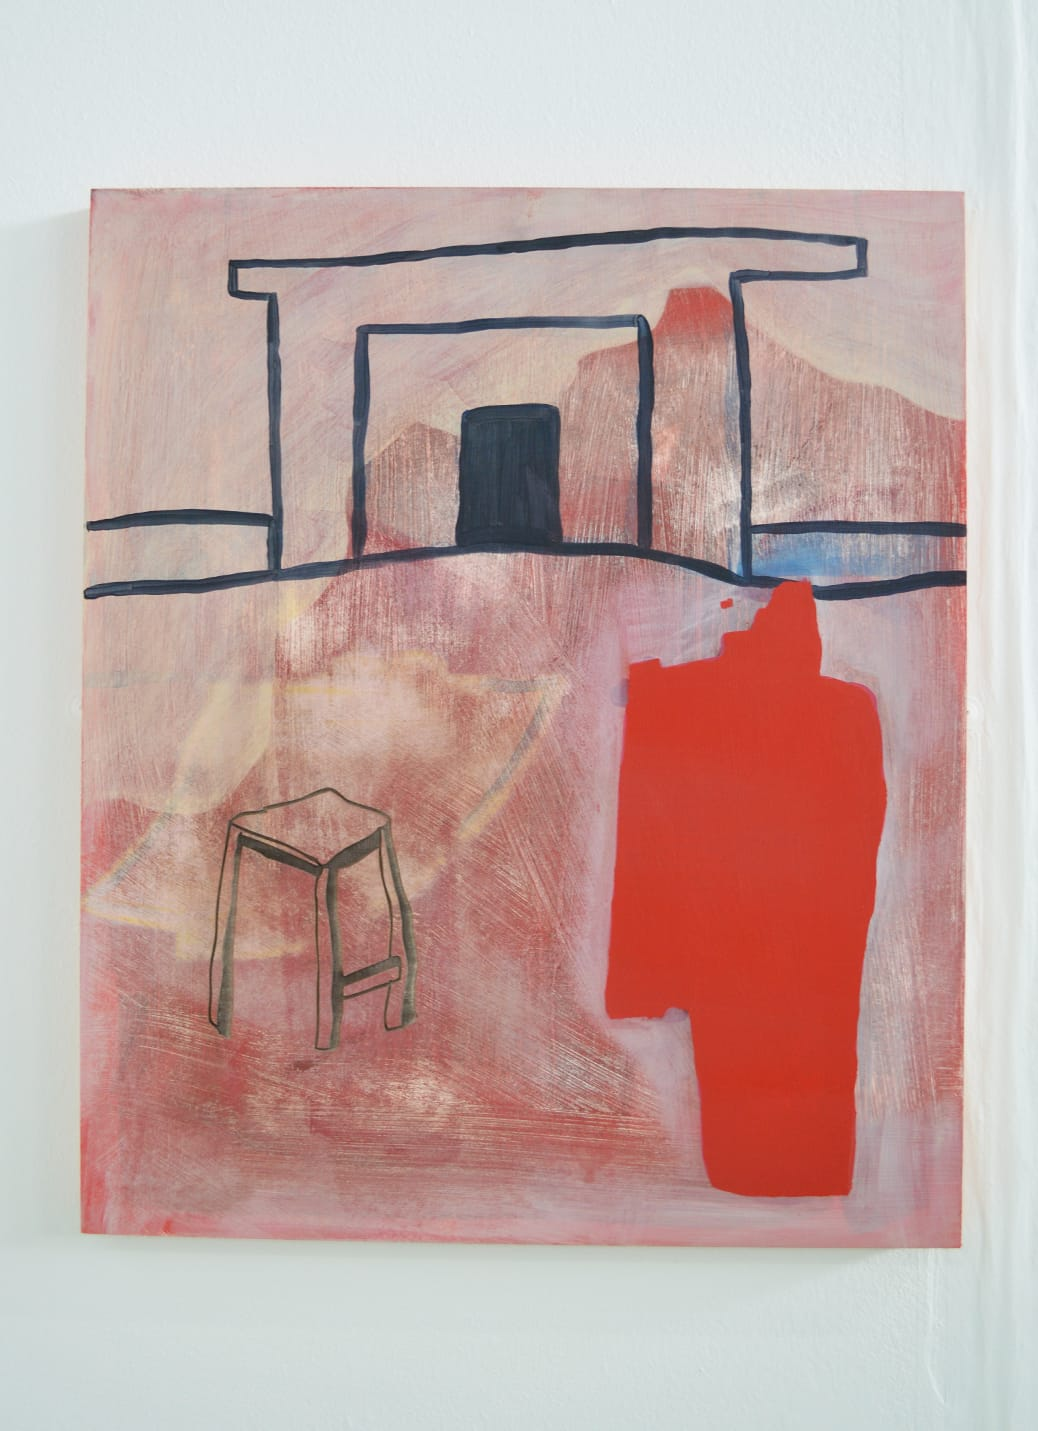 David Iain Brown, Fire, Fire, 2018